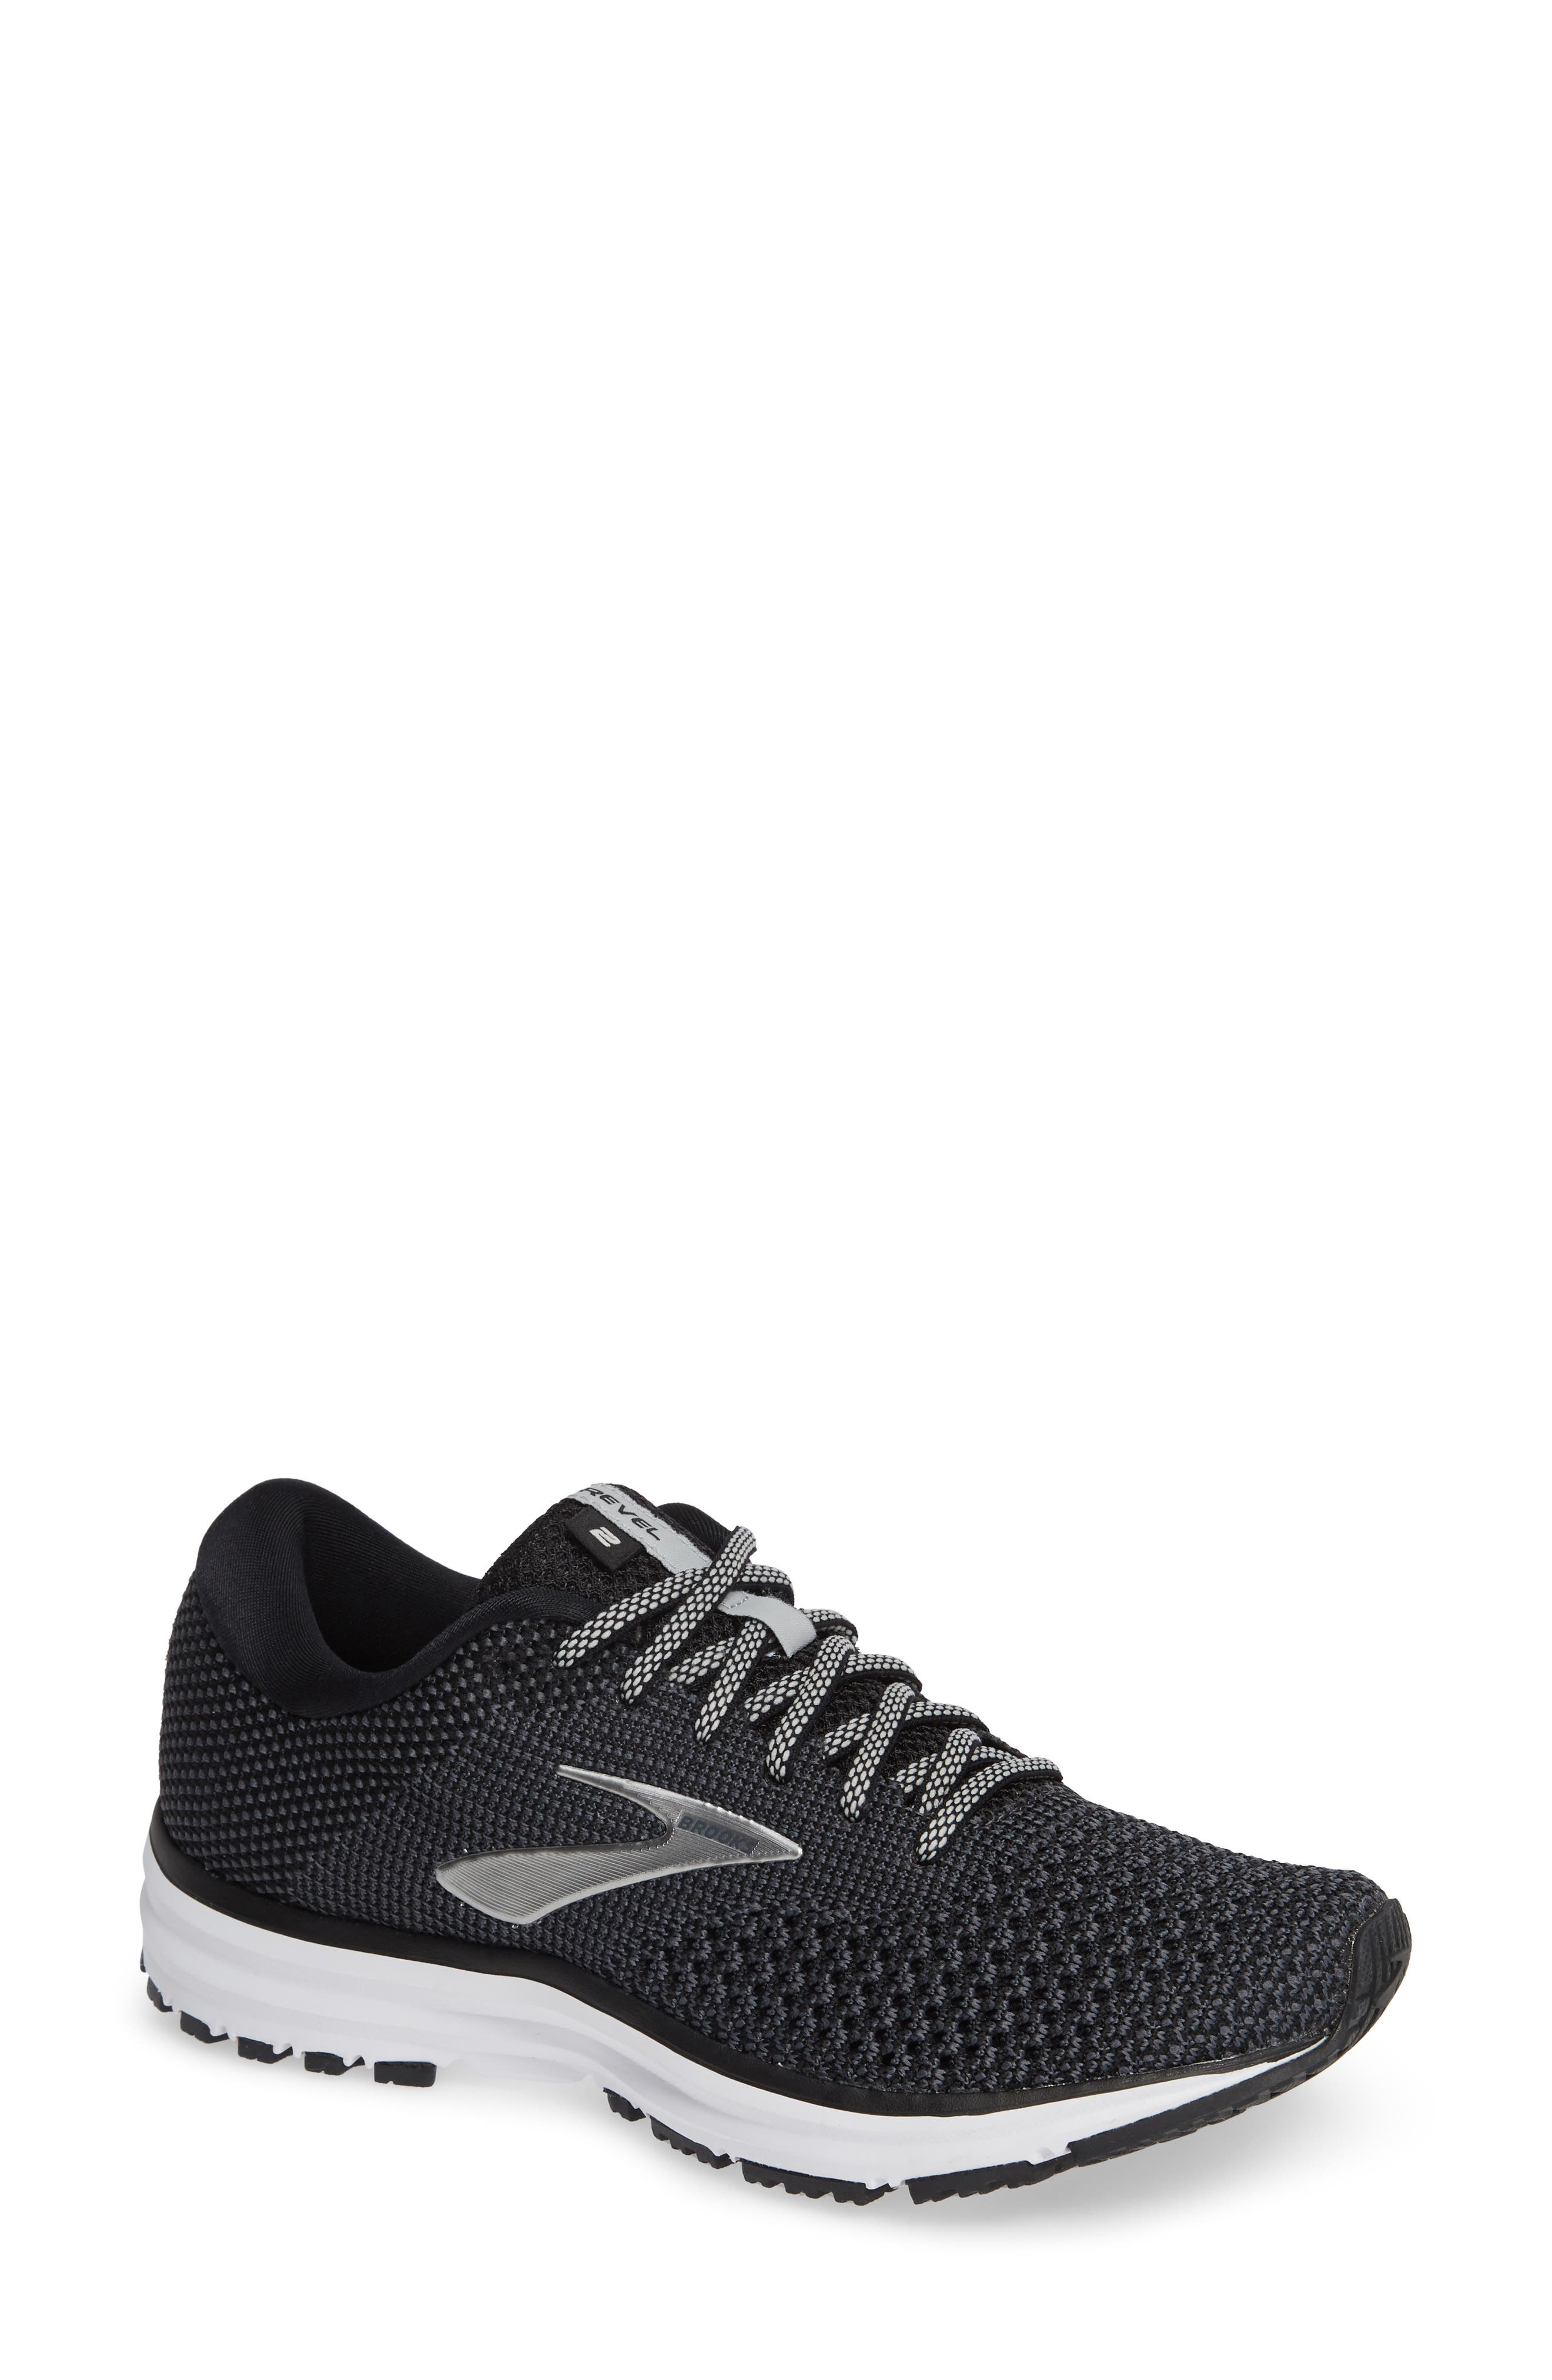 Revel 2 Running Shoe,                             Main thumbnail 1, color,                             BLACK/ GREY/ GREY